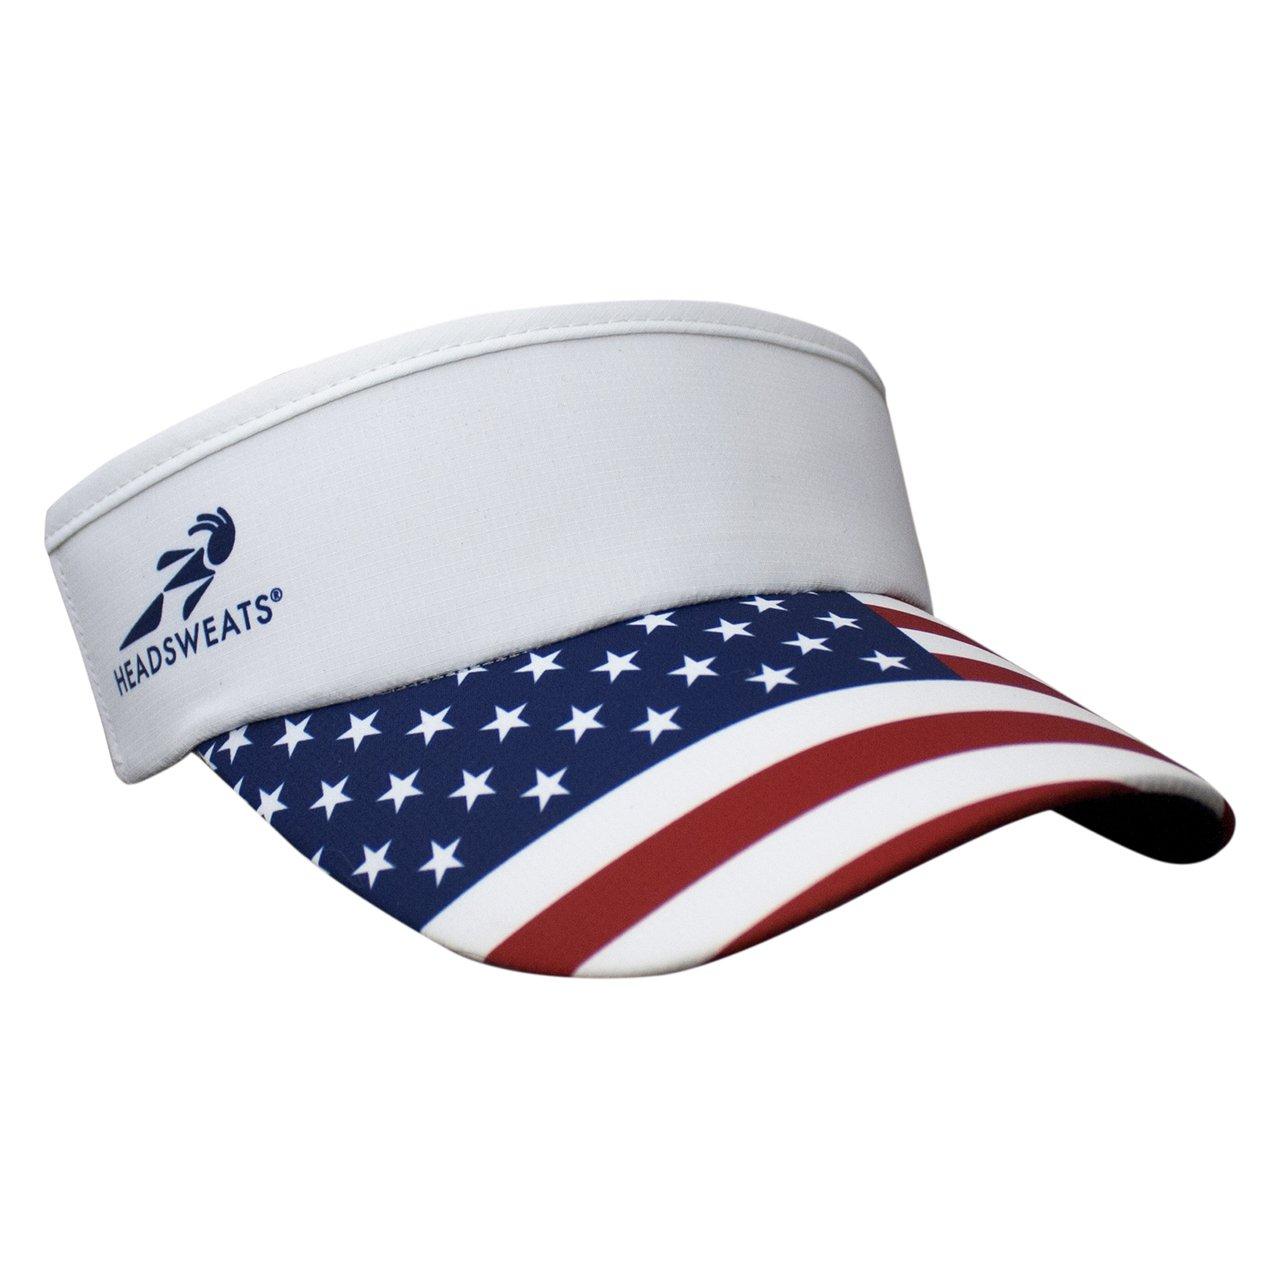 Headsweats Supervisor USA Flag Headwear, White, One Size 7703